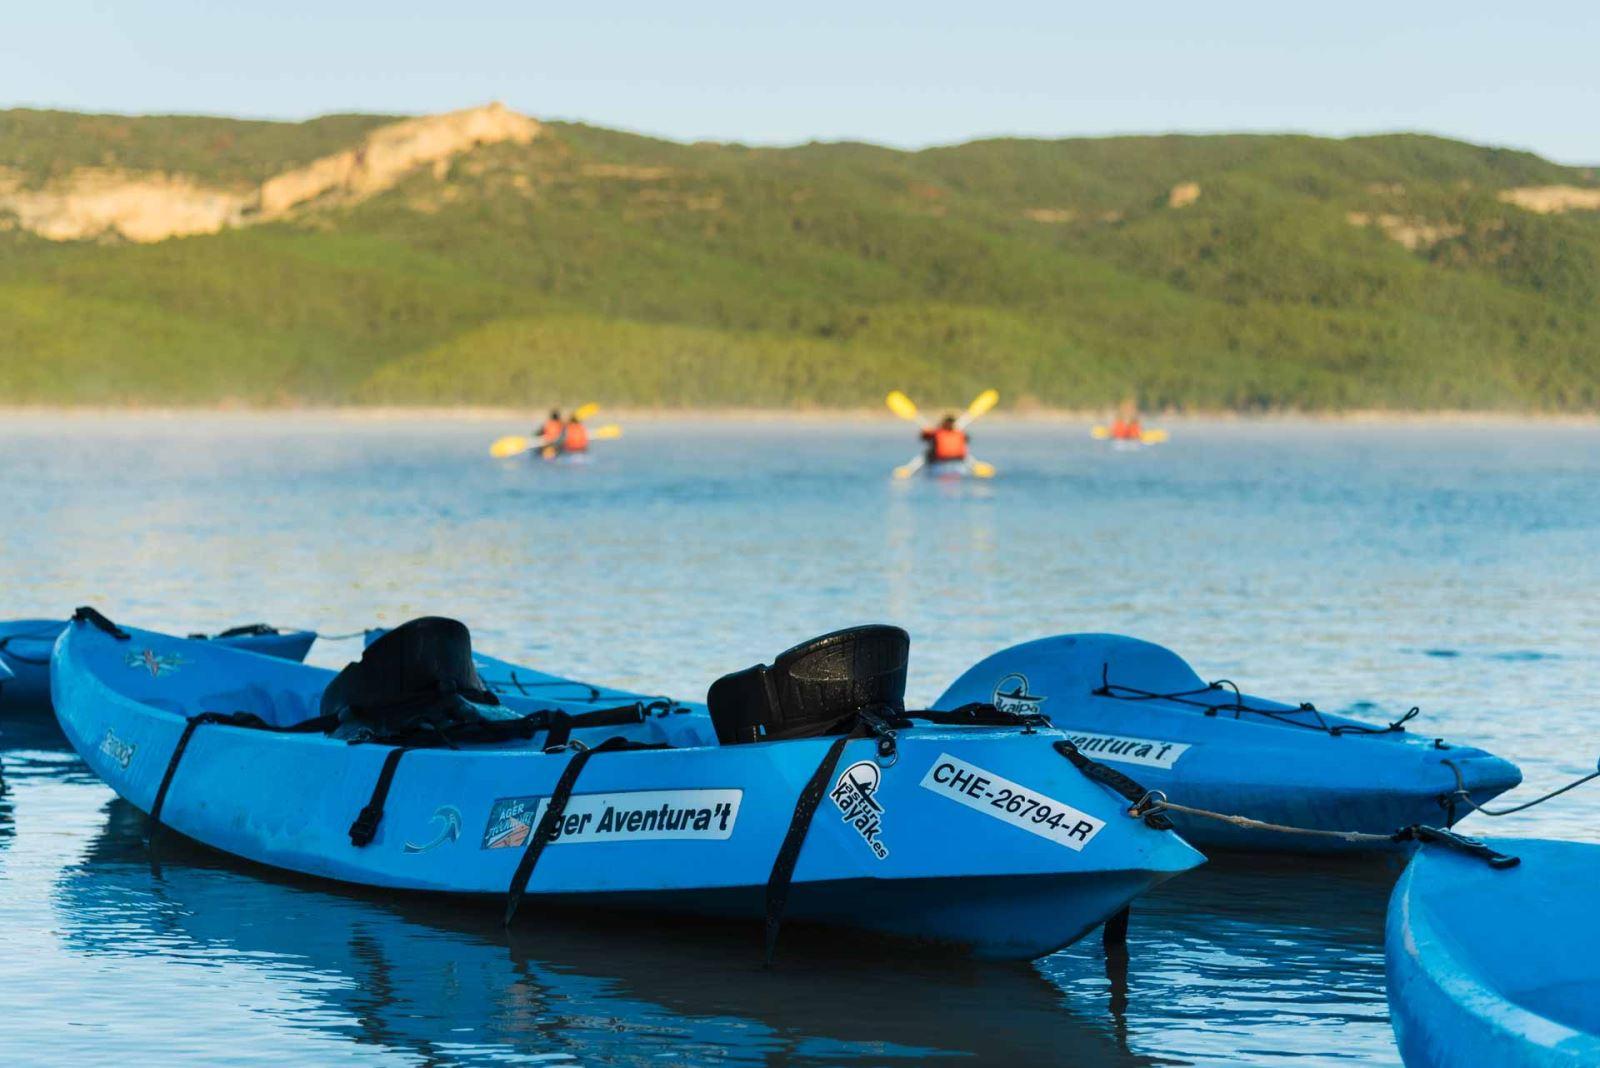 kayaks, � ger, congost, montrebei, fet, canelles, finestres, corç� , barco